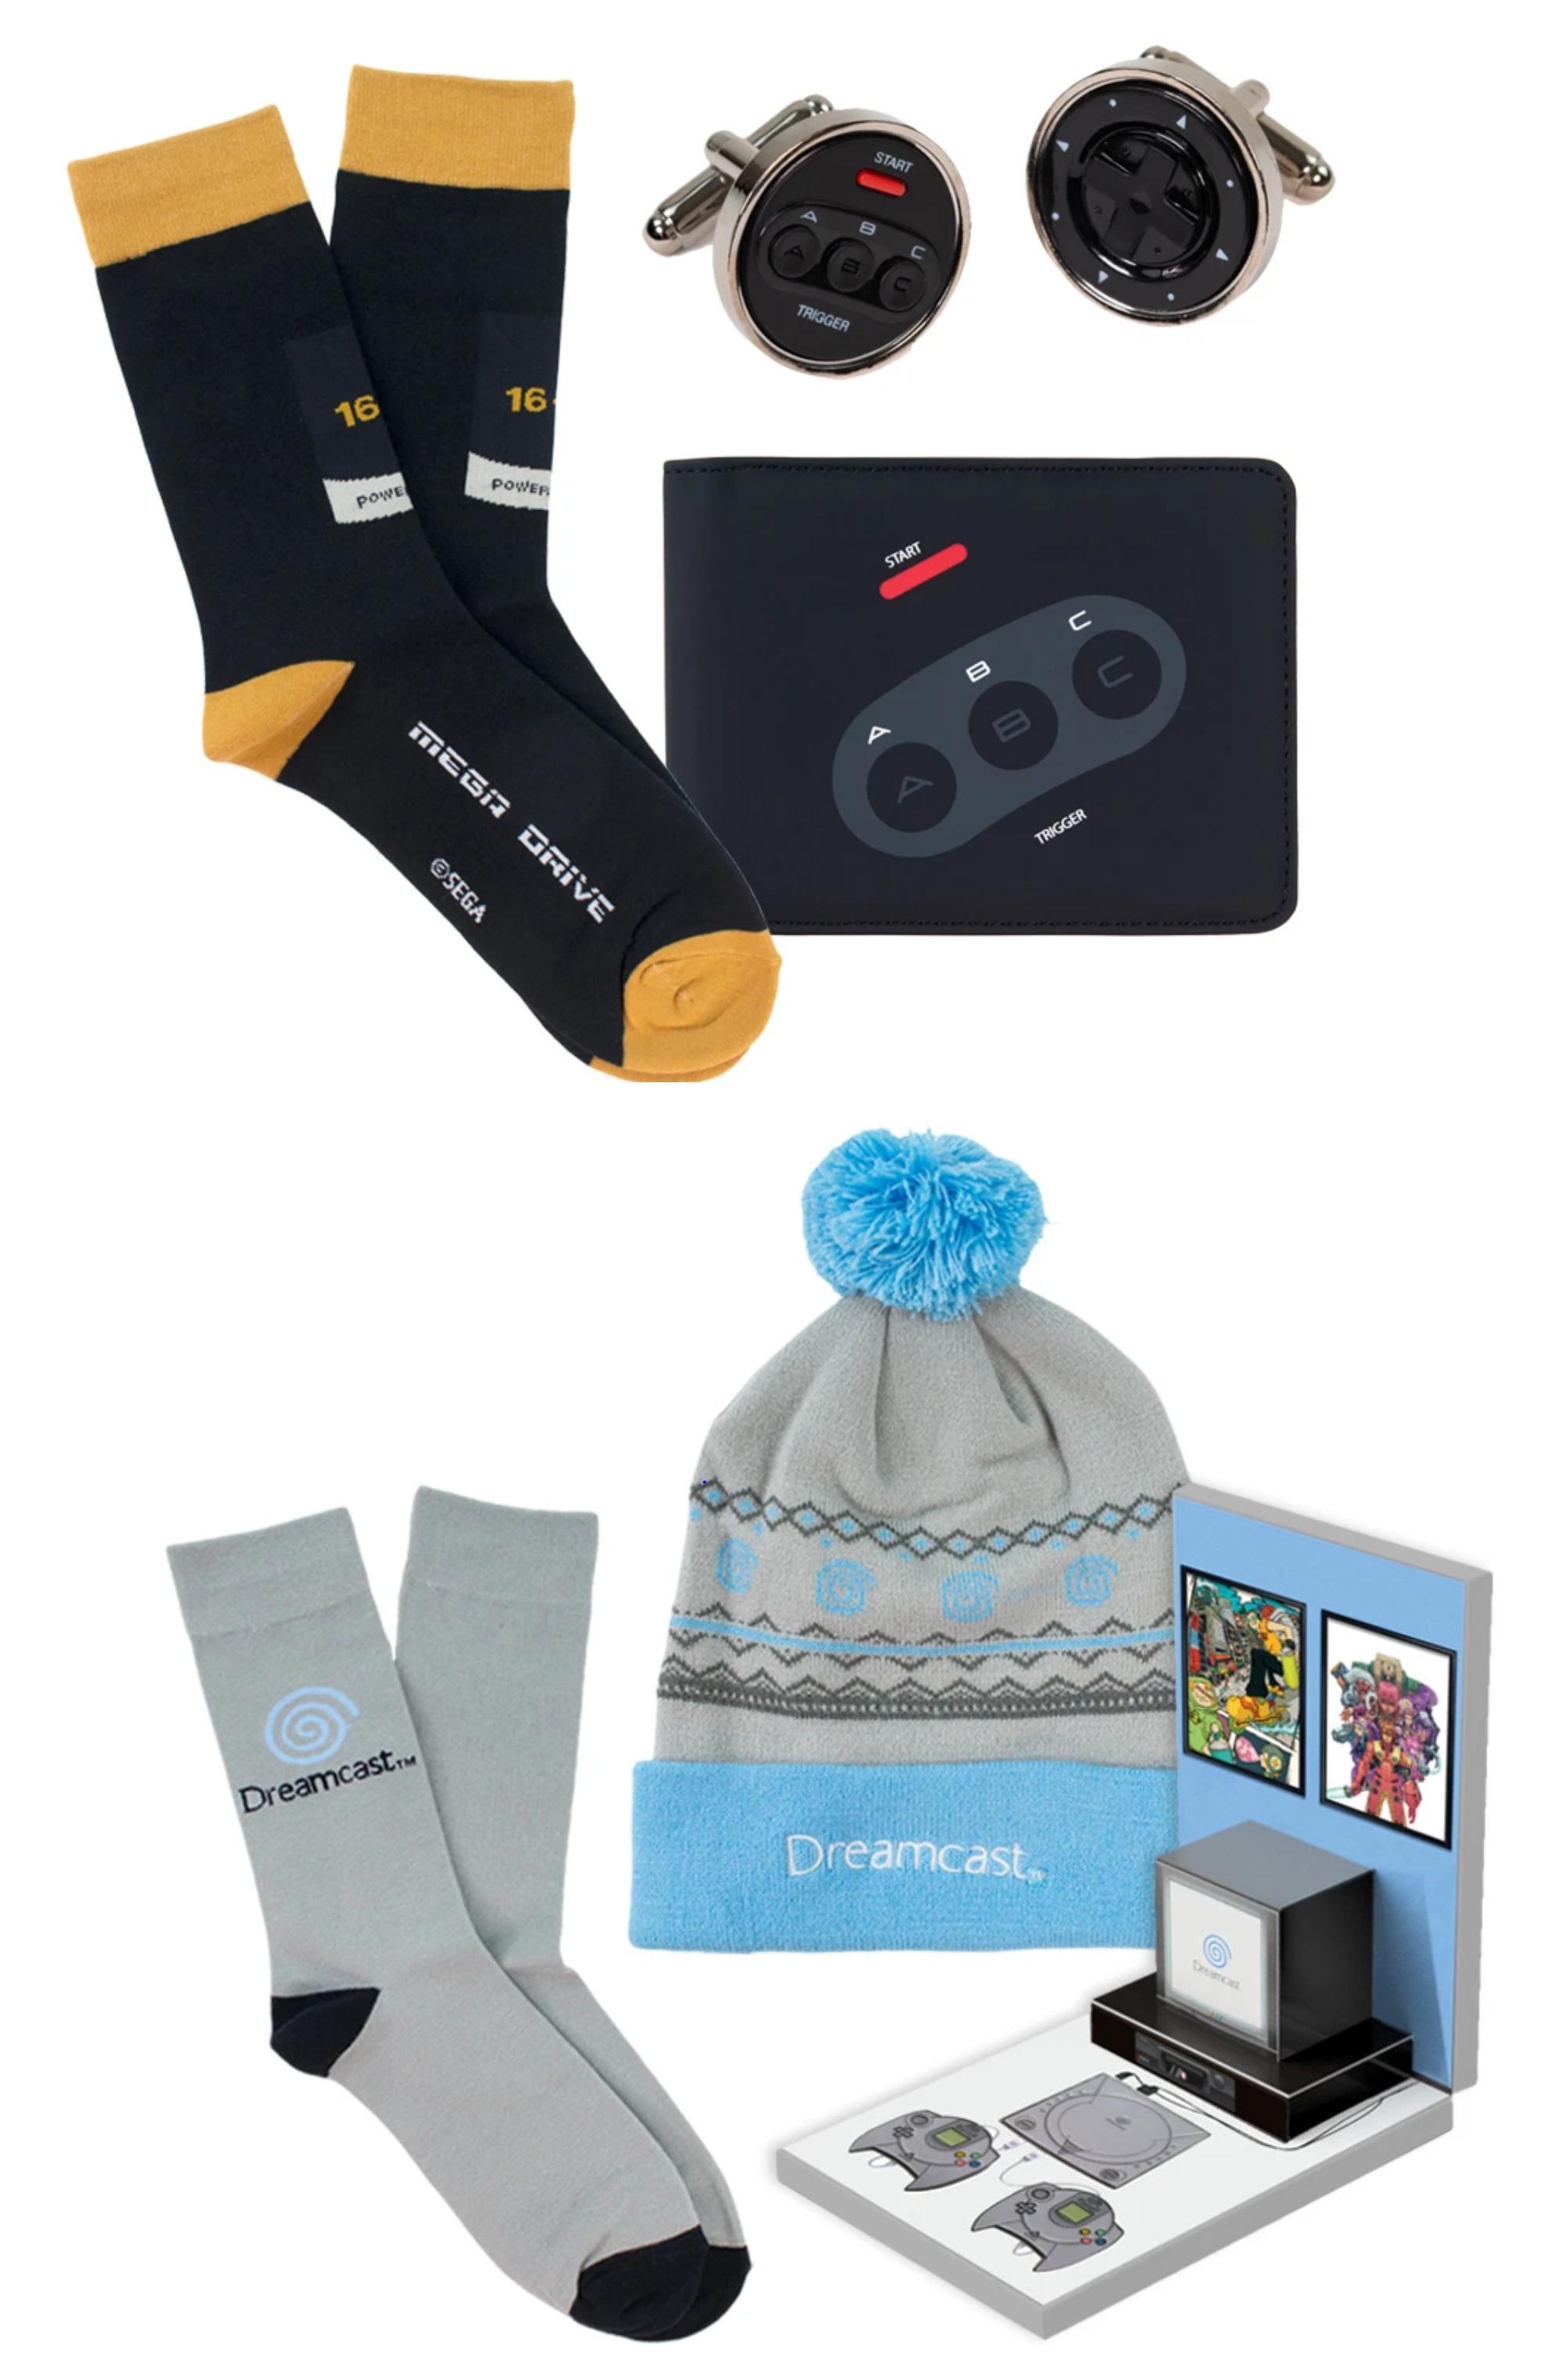 Mega Drive Fashion & Accessories Bundle - £15 / Dreamcast Fashion & Accessories Bundle - £25 + £2 postage @ Sega Shop